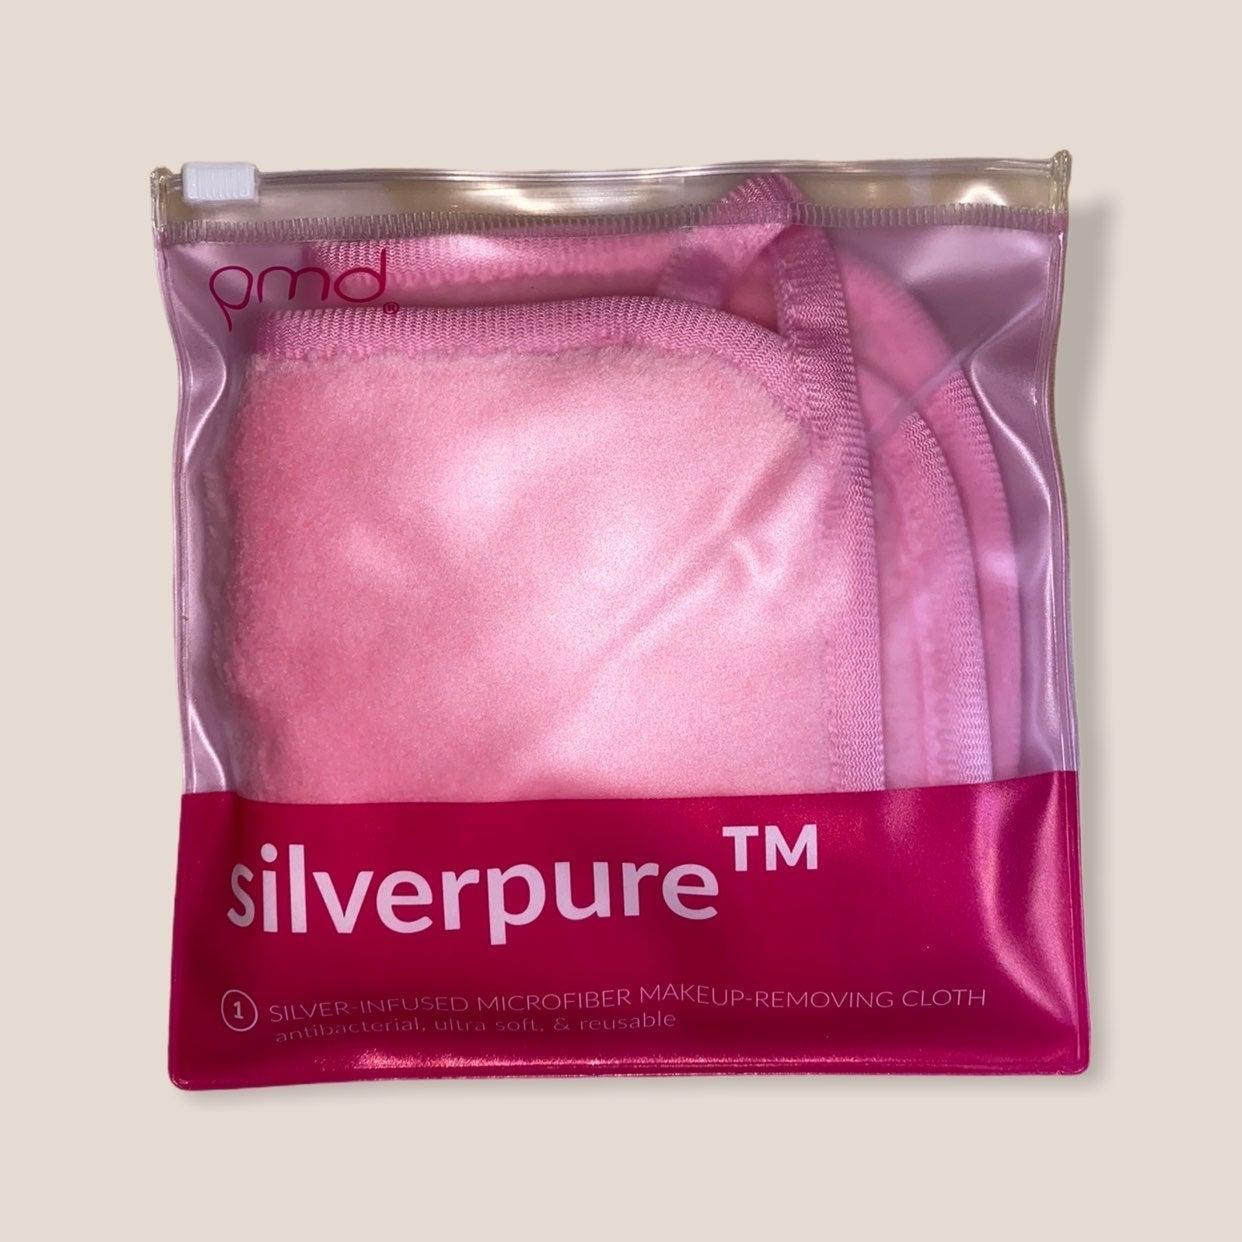 microfiber makeup removing cloth